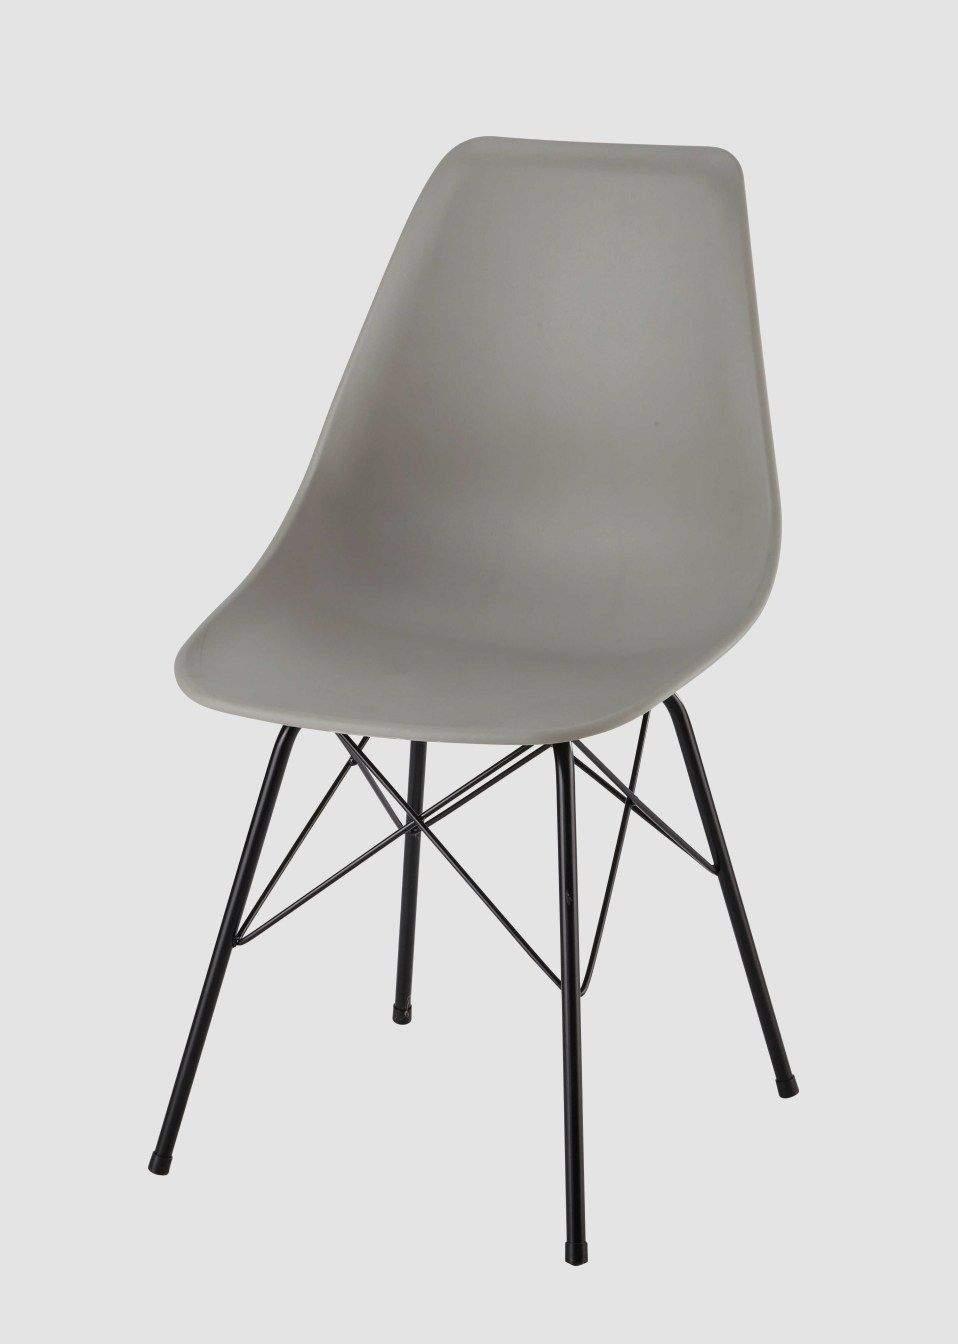 stuhl metall schwarz stuhl schwarz metall neu stuhl aus polypropylen und metall hellgrau genial